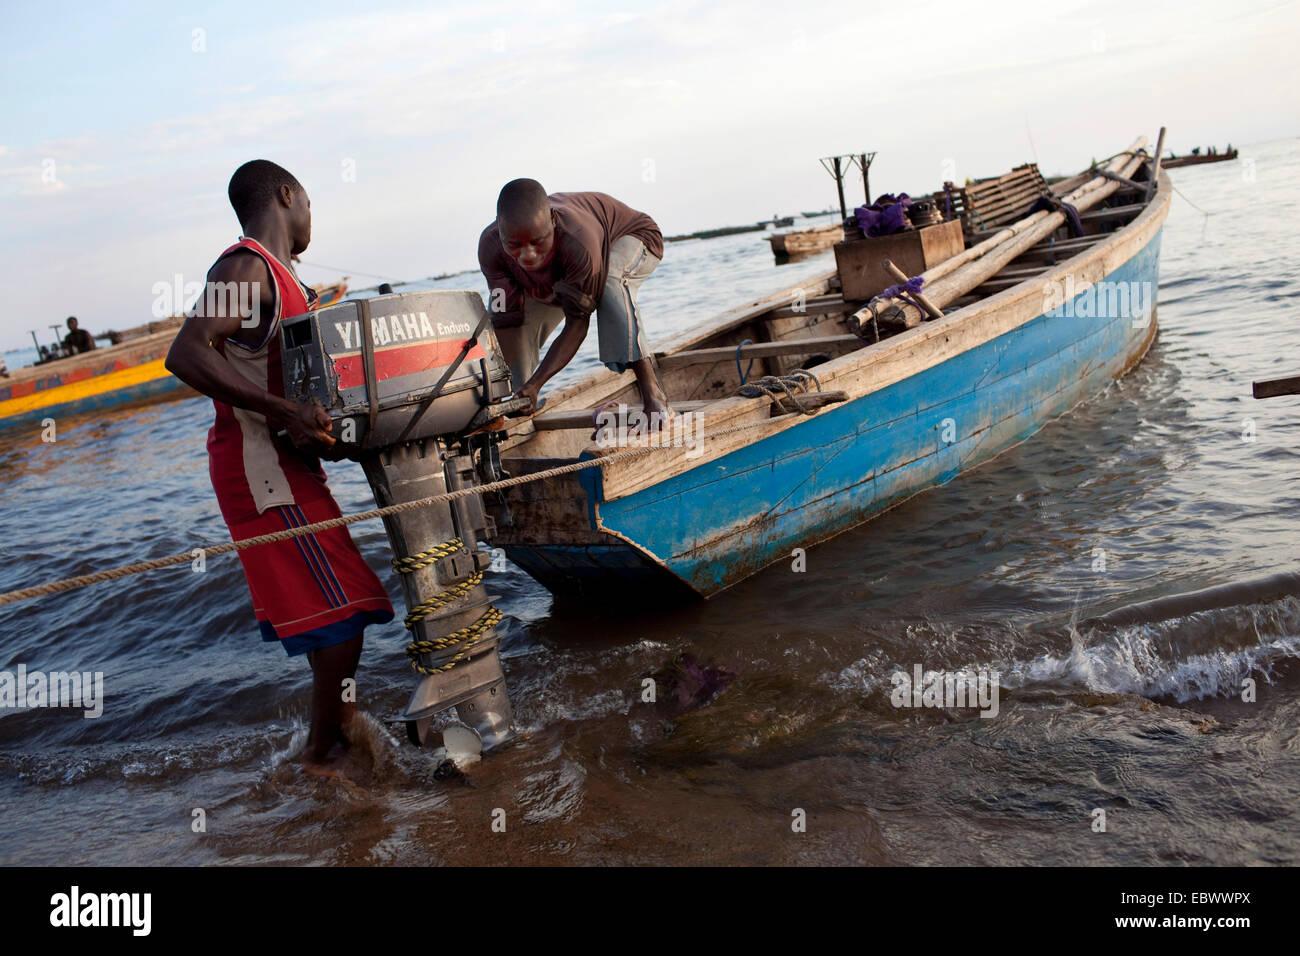 fishermen fixing engine at traditional fishing boat, Burundi, Mvugo, Nyanza Lac - Stock Image